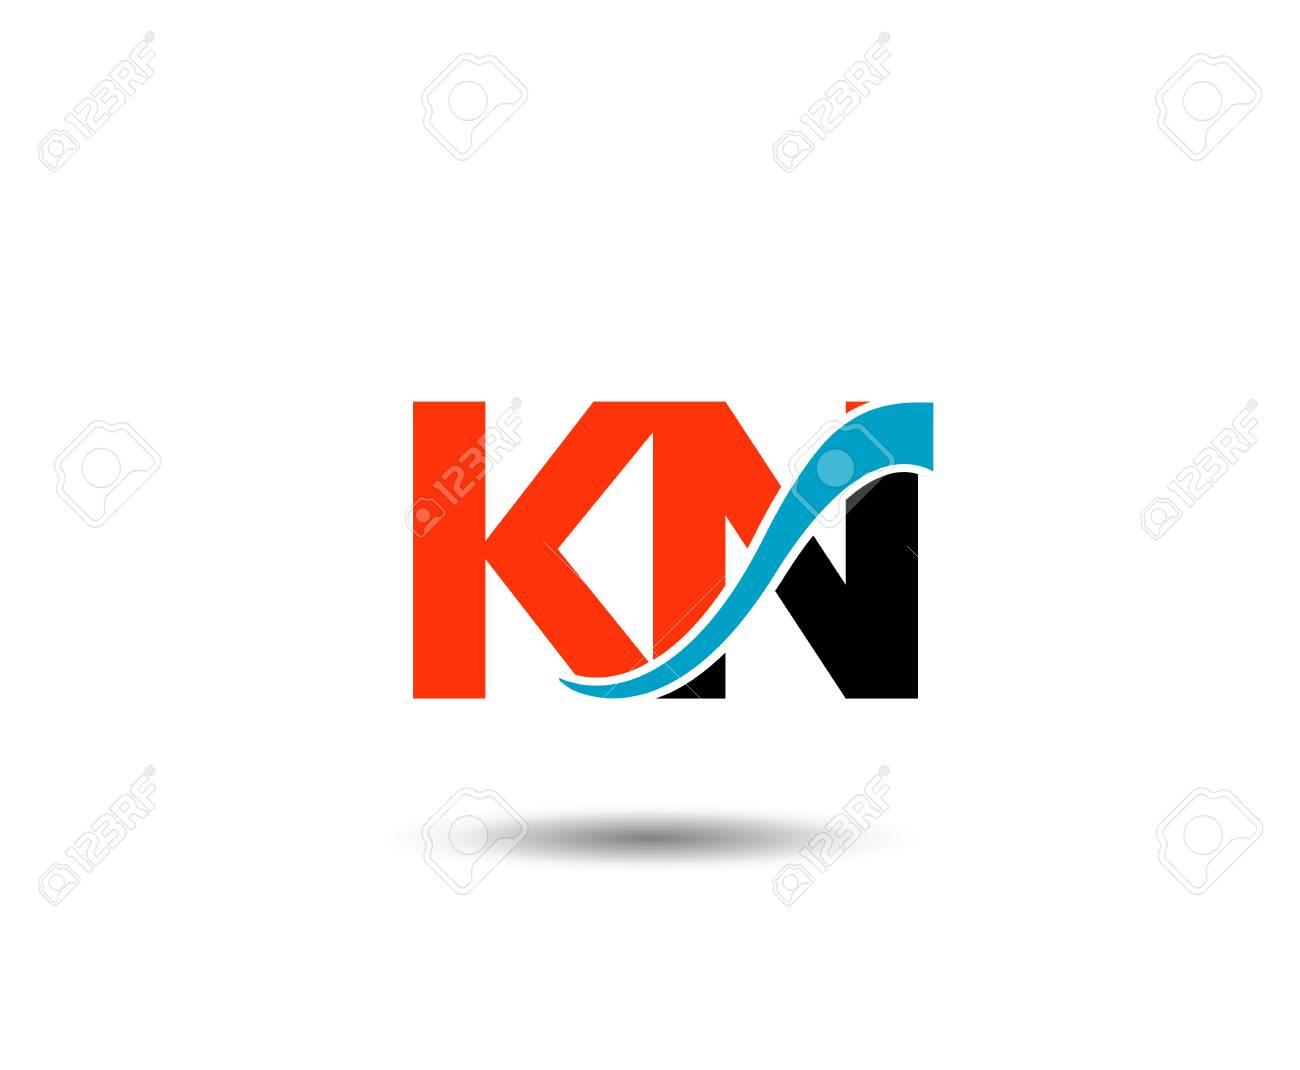 Enement Letter   Kn Letter Vector Graphic Element Letter Branding Royalty Free